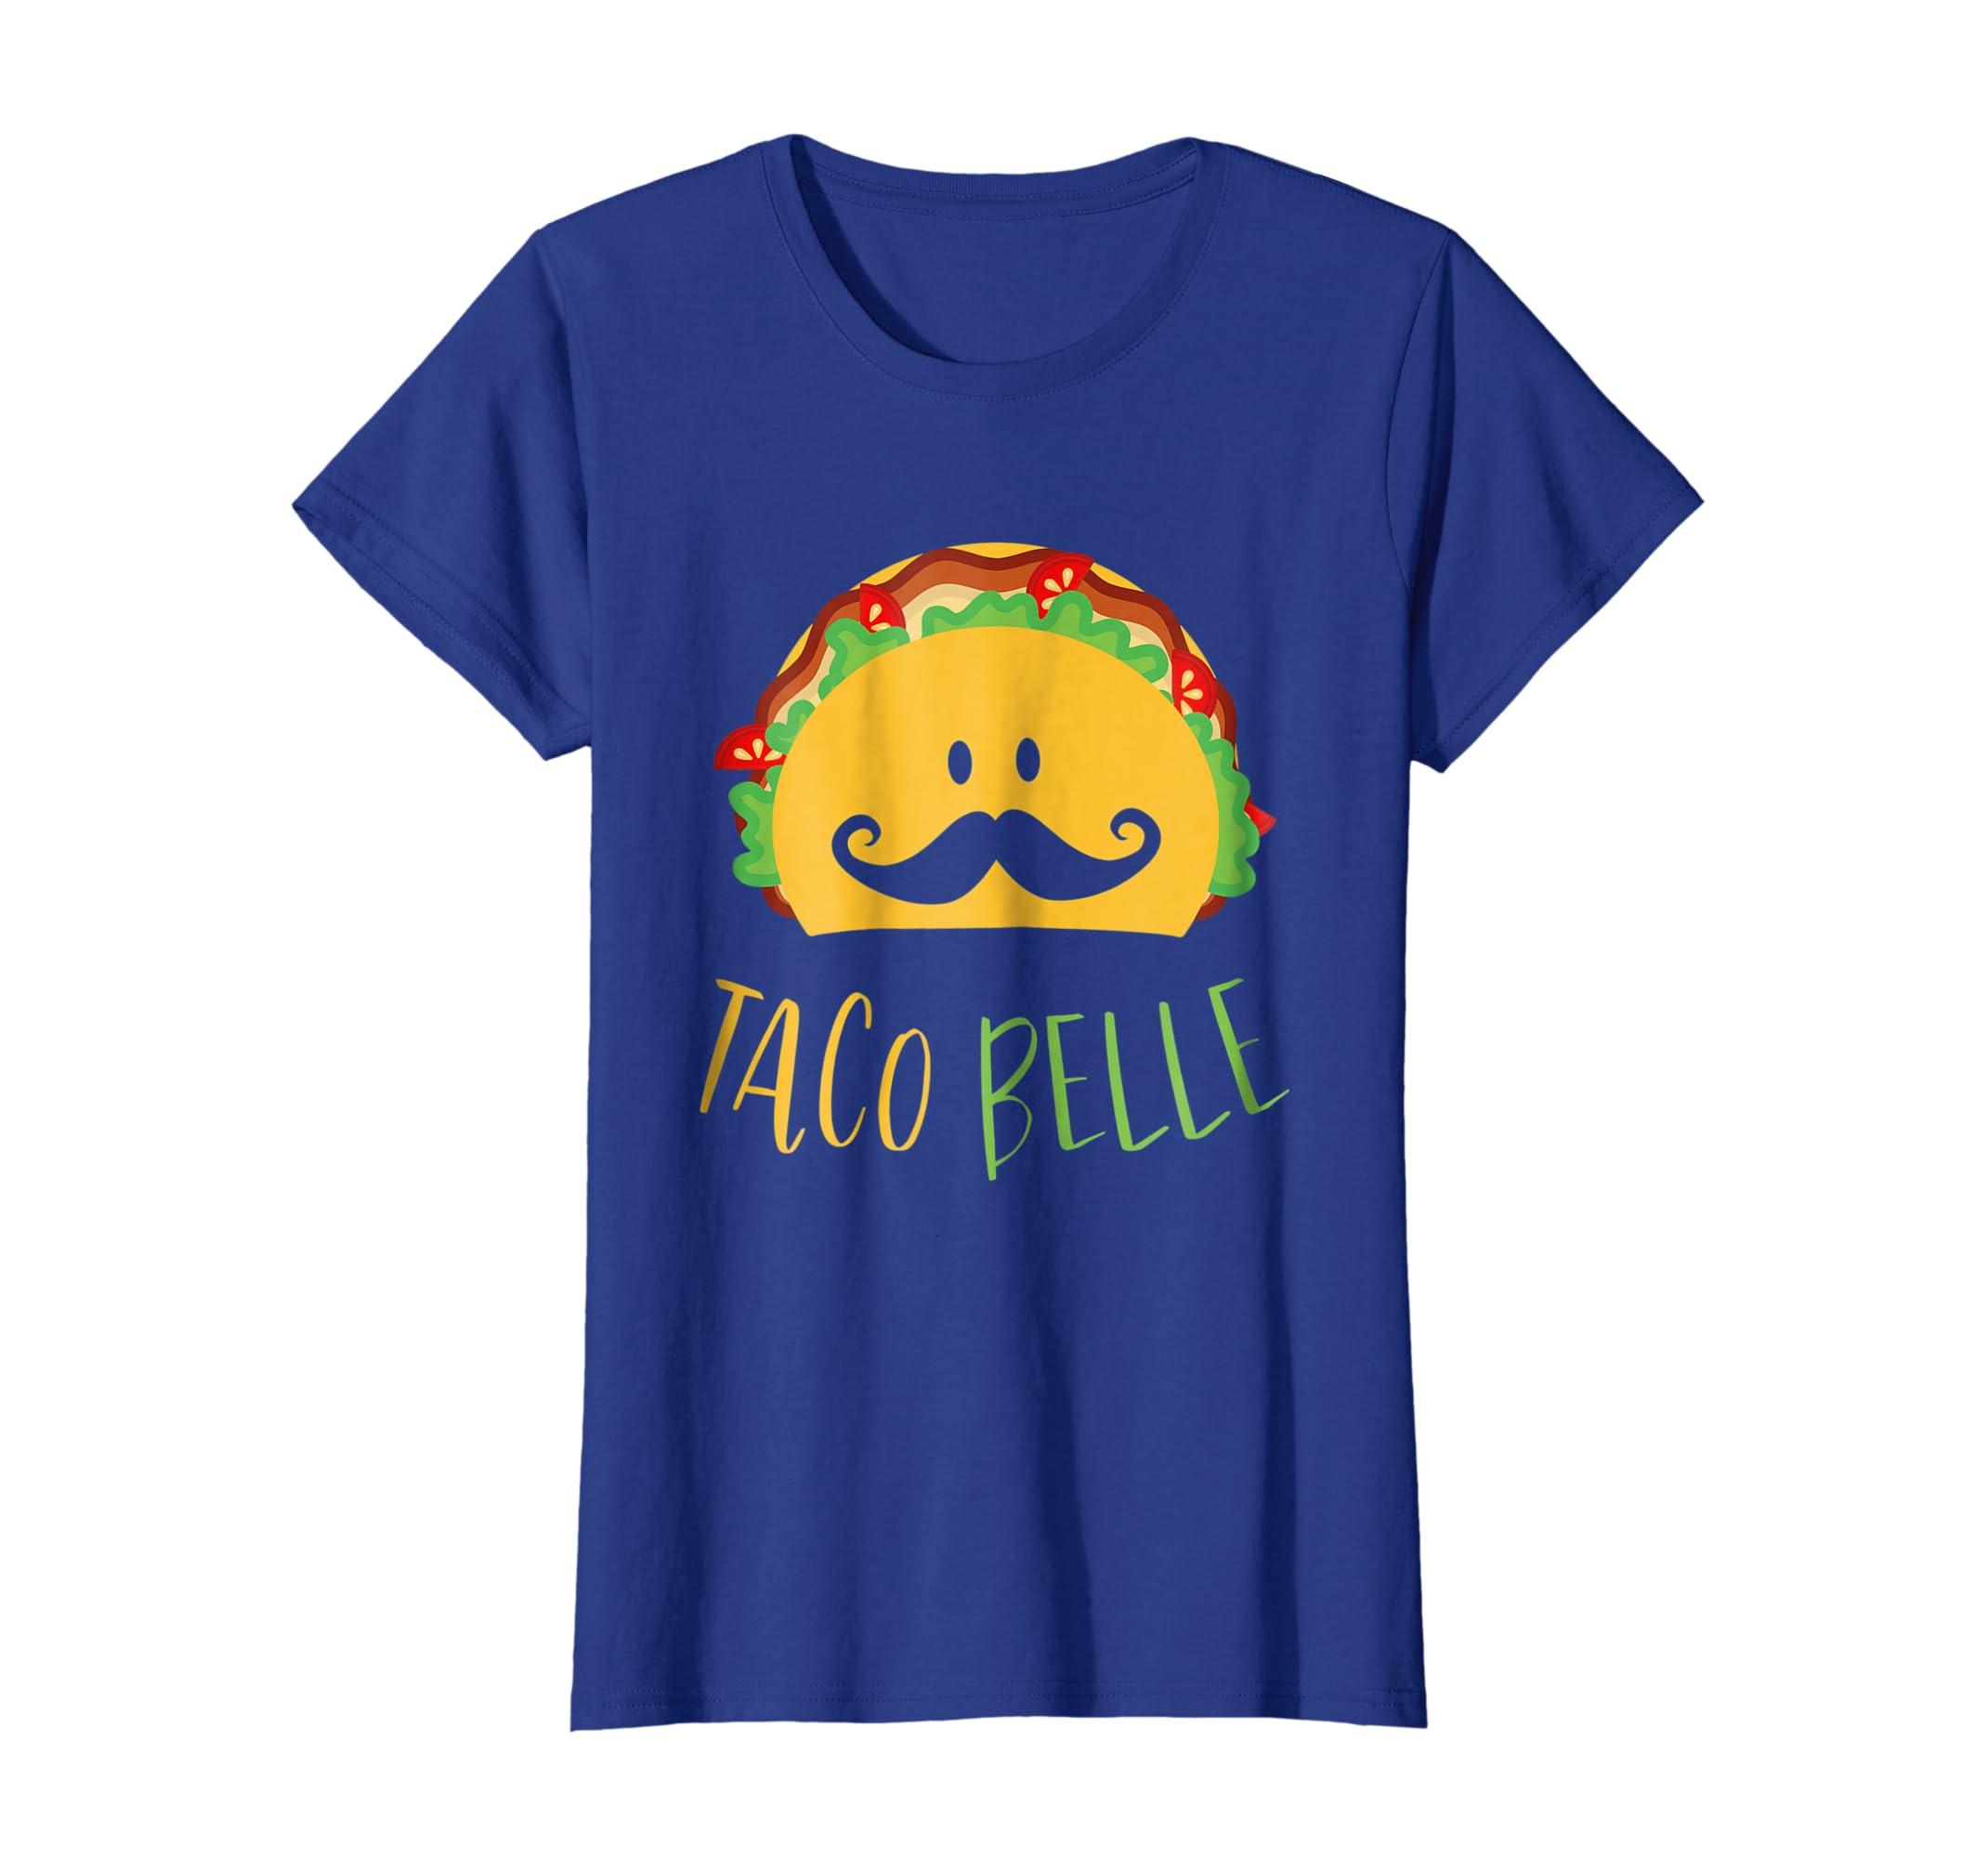 68319a47 Amazon.com: Funny Taco Belle T-Shirt - Funny Taco Face Shirt: Clothing